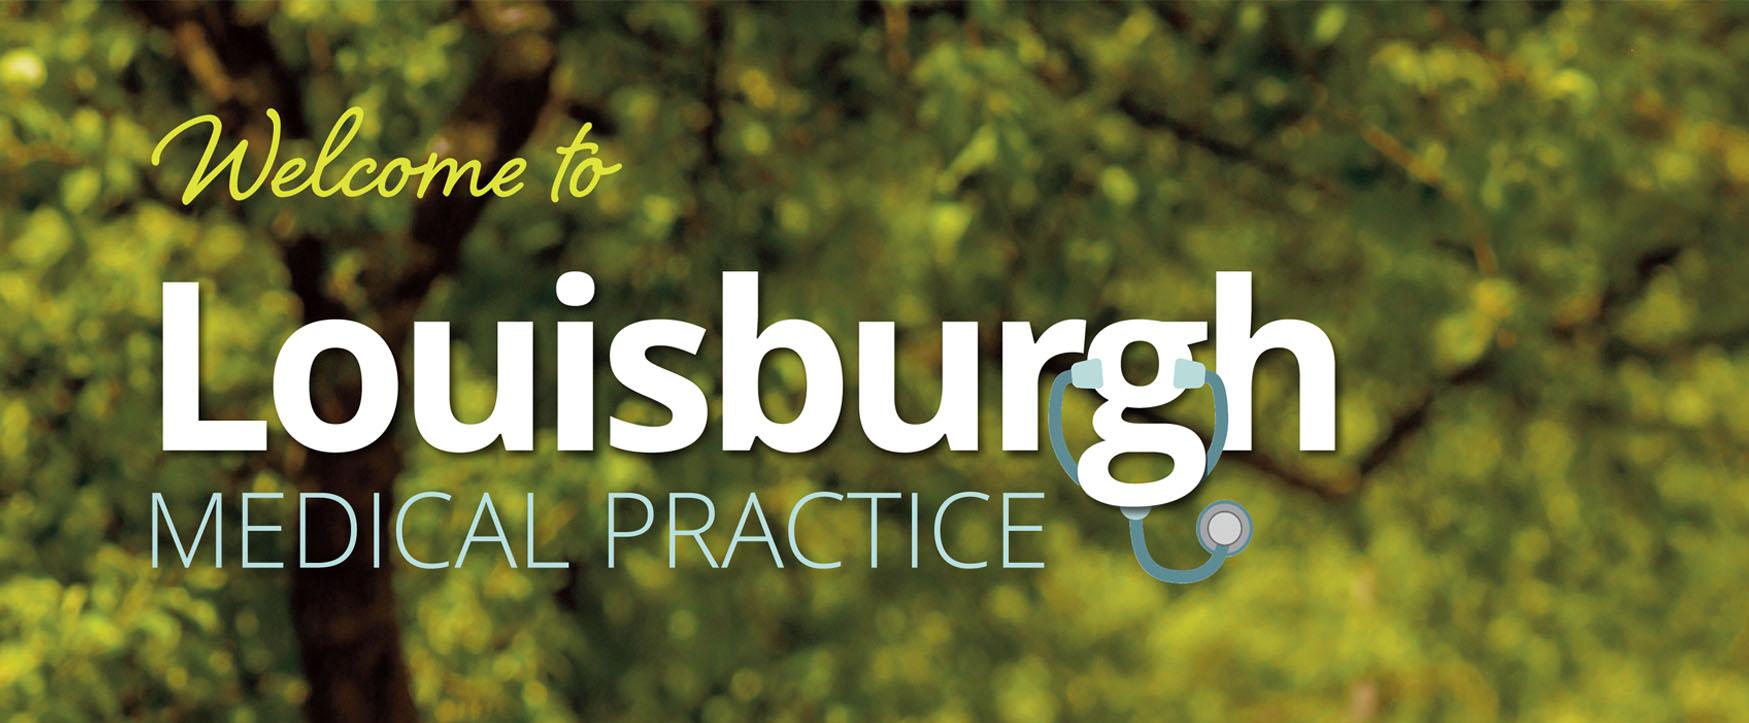 Louisburgh doctor Medical Practice Mayo